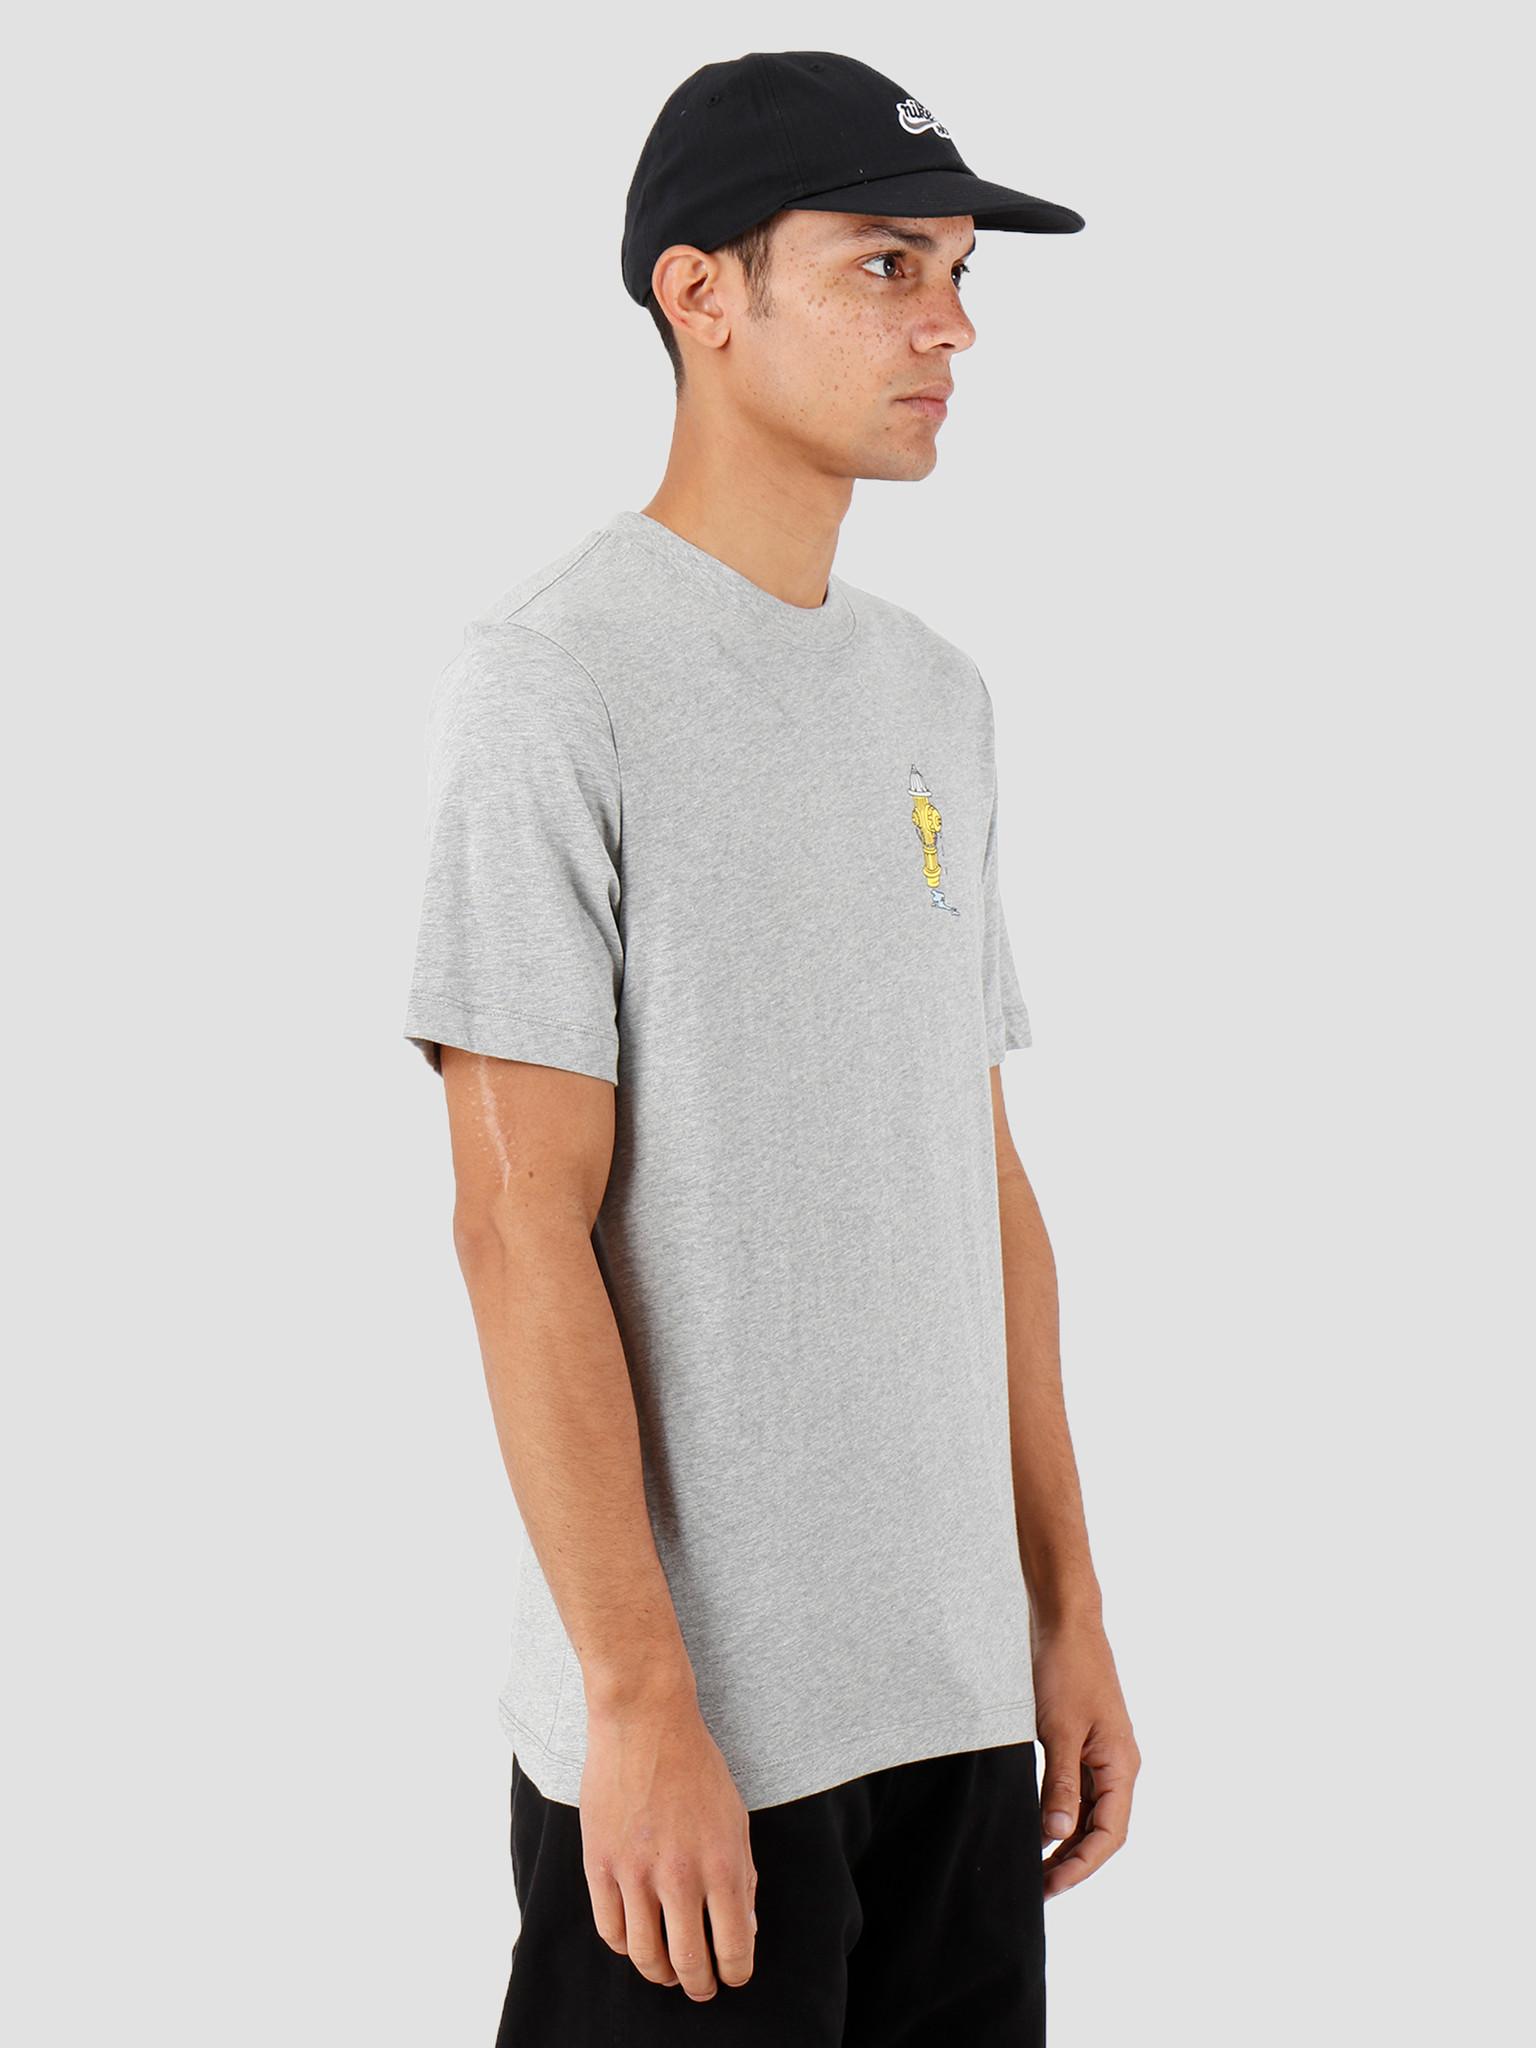 Nike Nike SB T-Shirt DK Grey Heather Cj0448-063